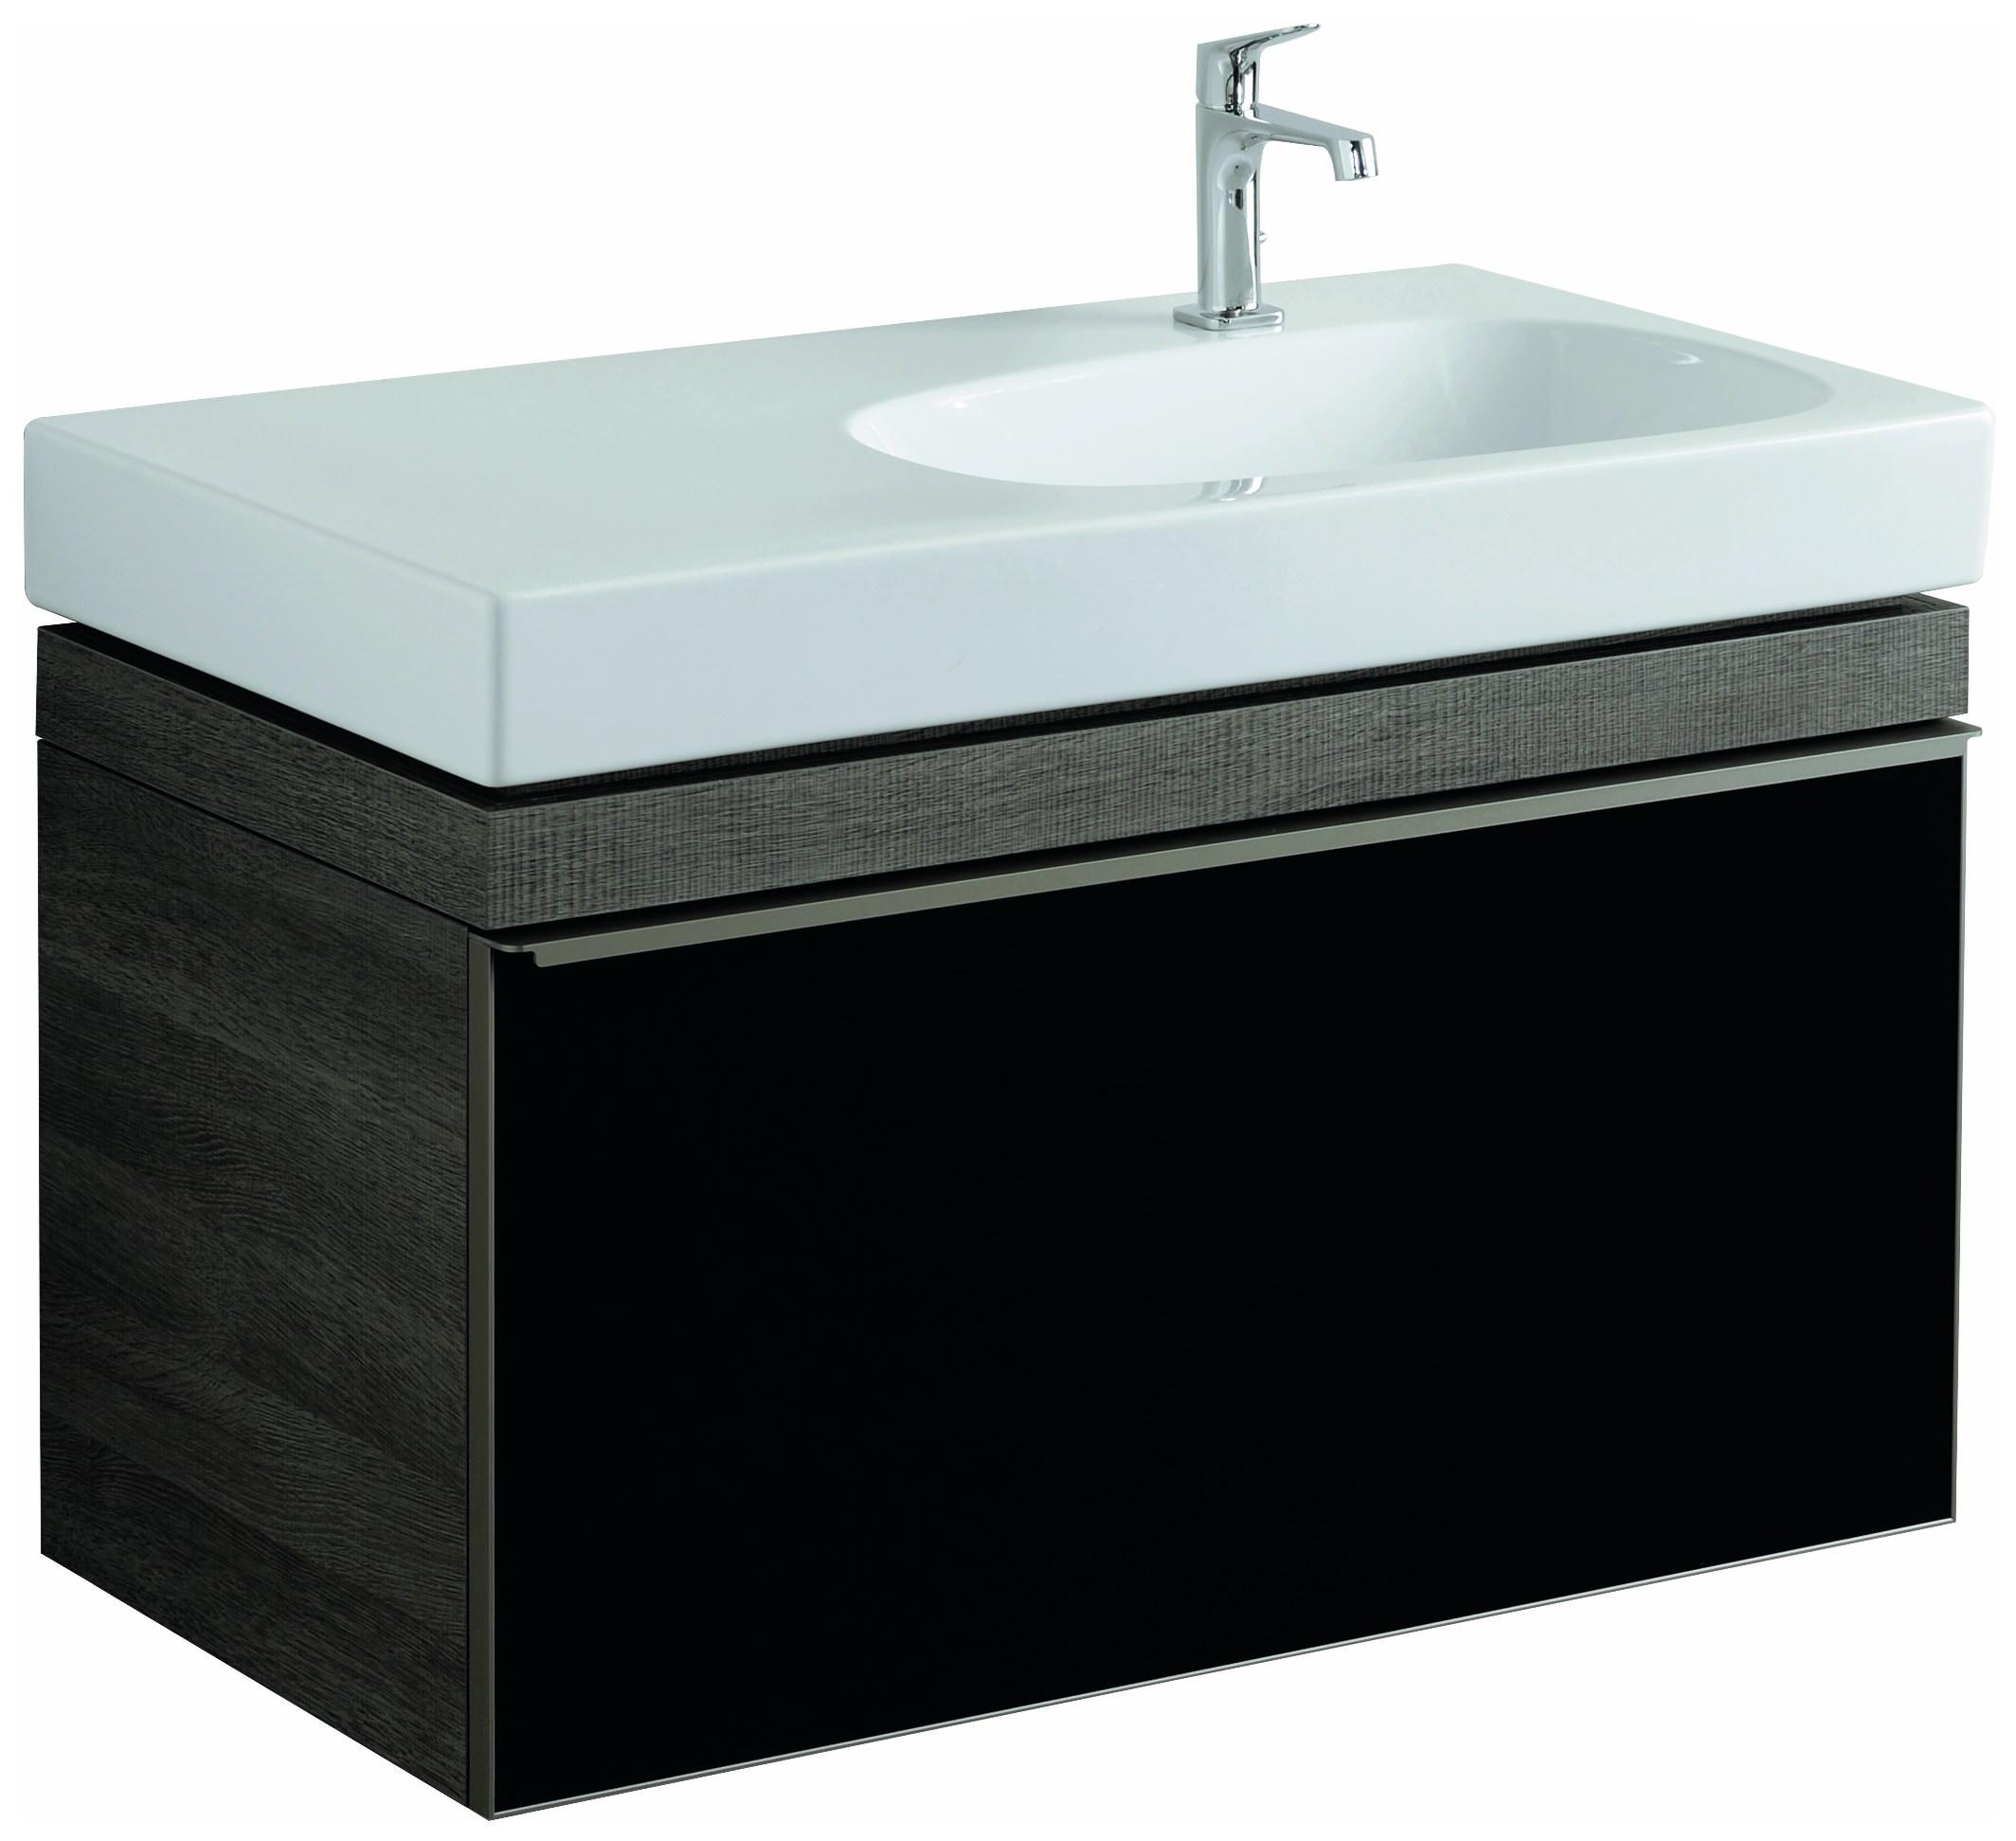 keramag citterio waschtischunterschrank 884x554x504mm holzstruktur graubraun 835191000. Black Bedroom Furniture Sets. Home Design Ideas